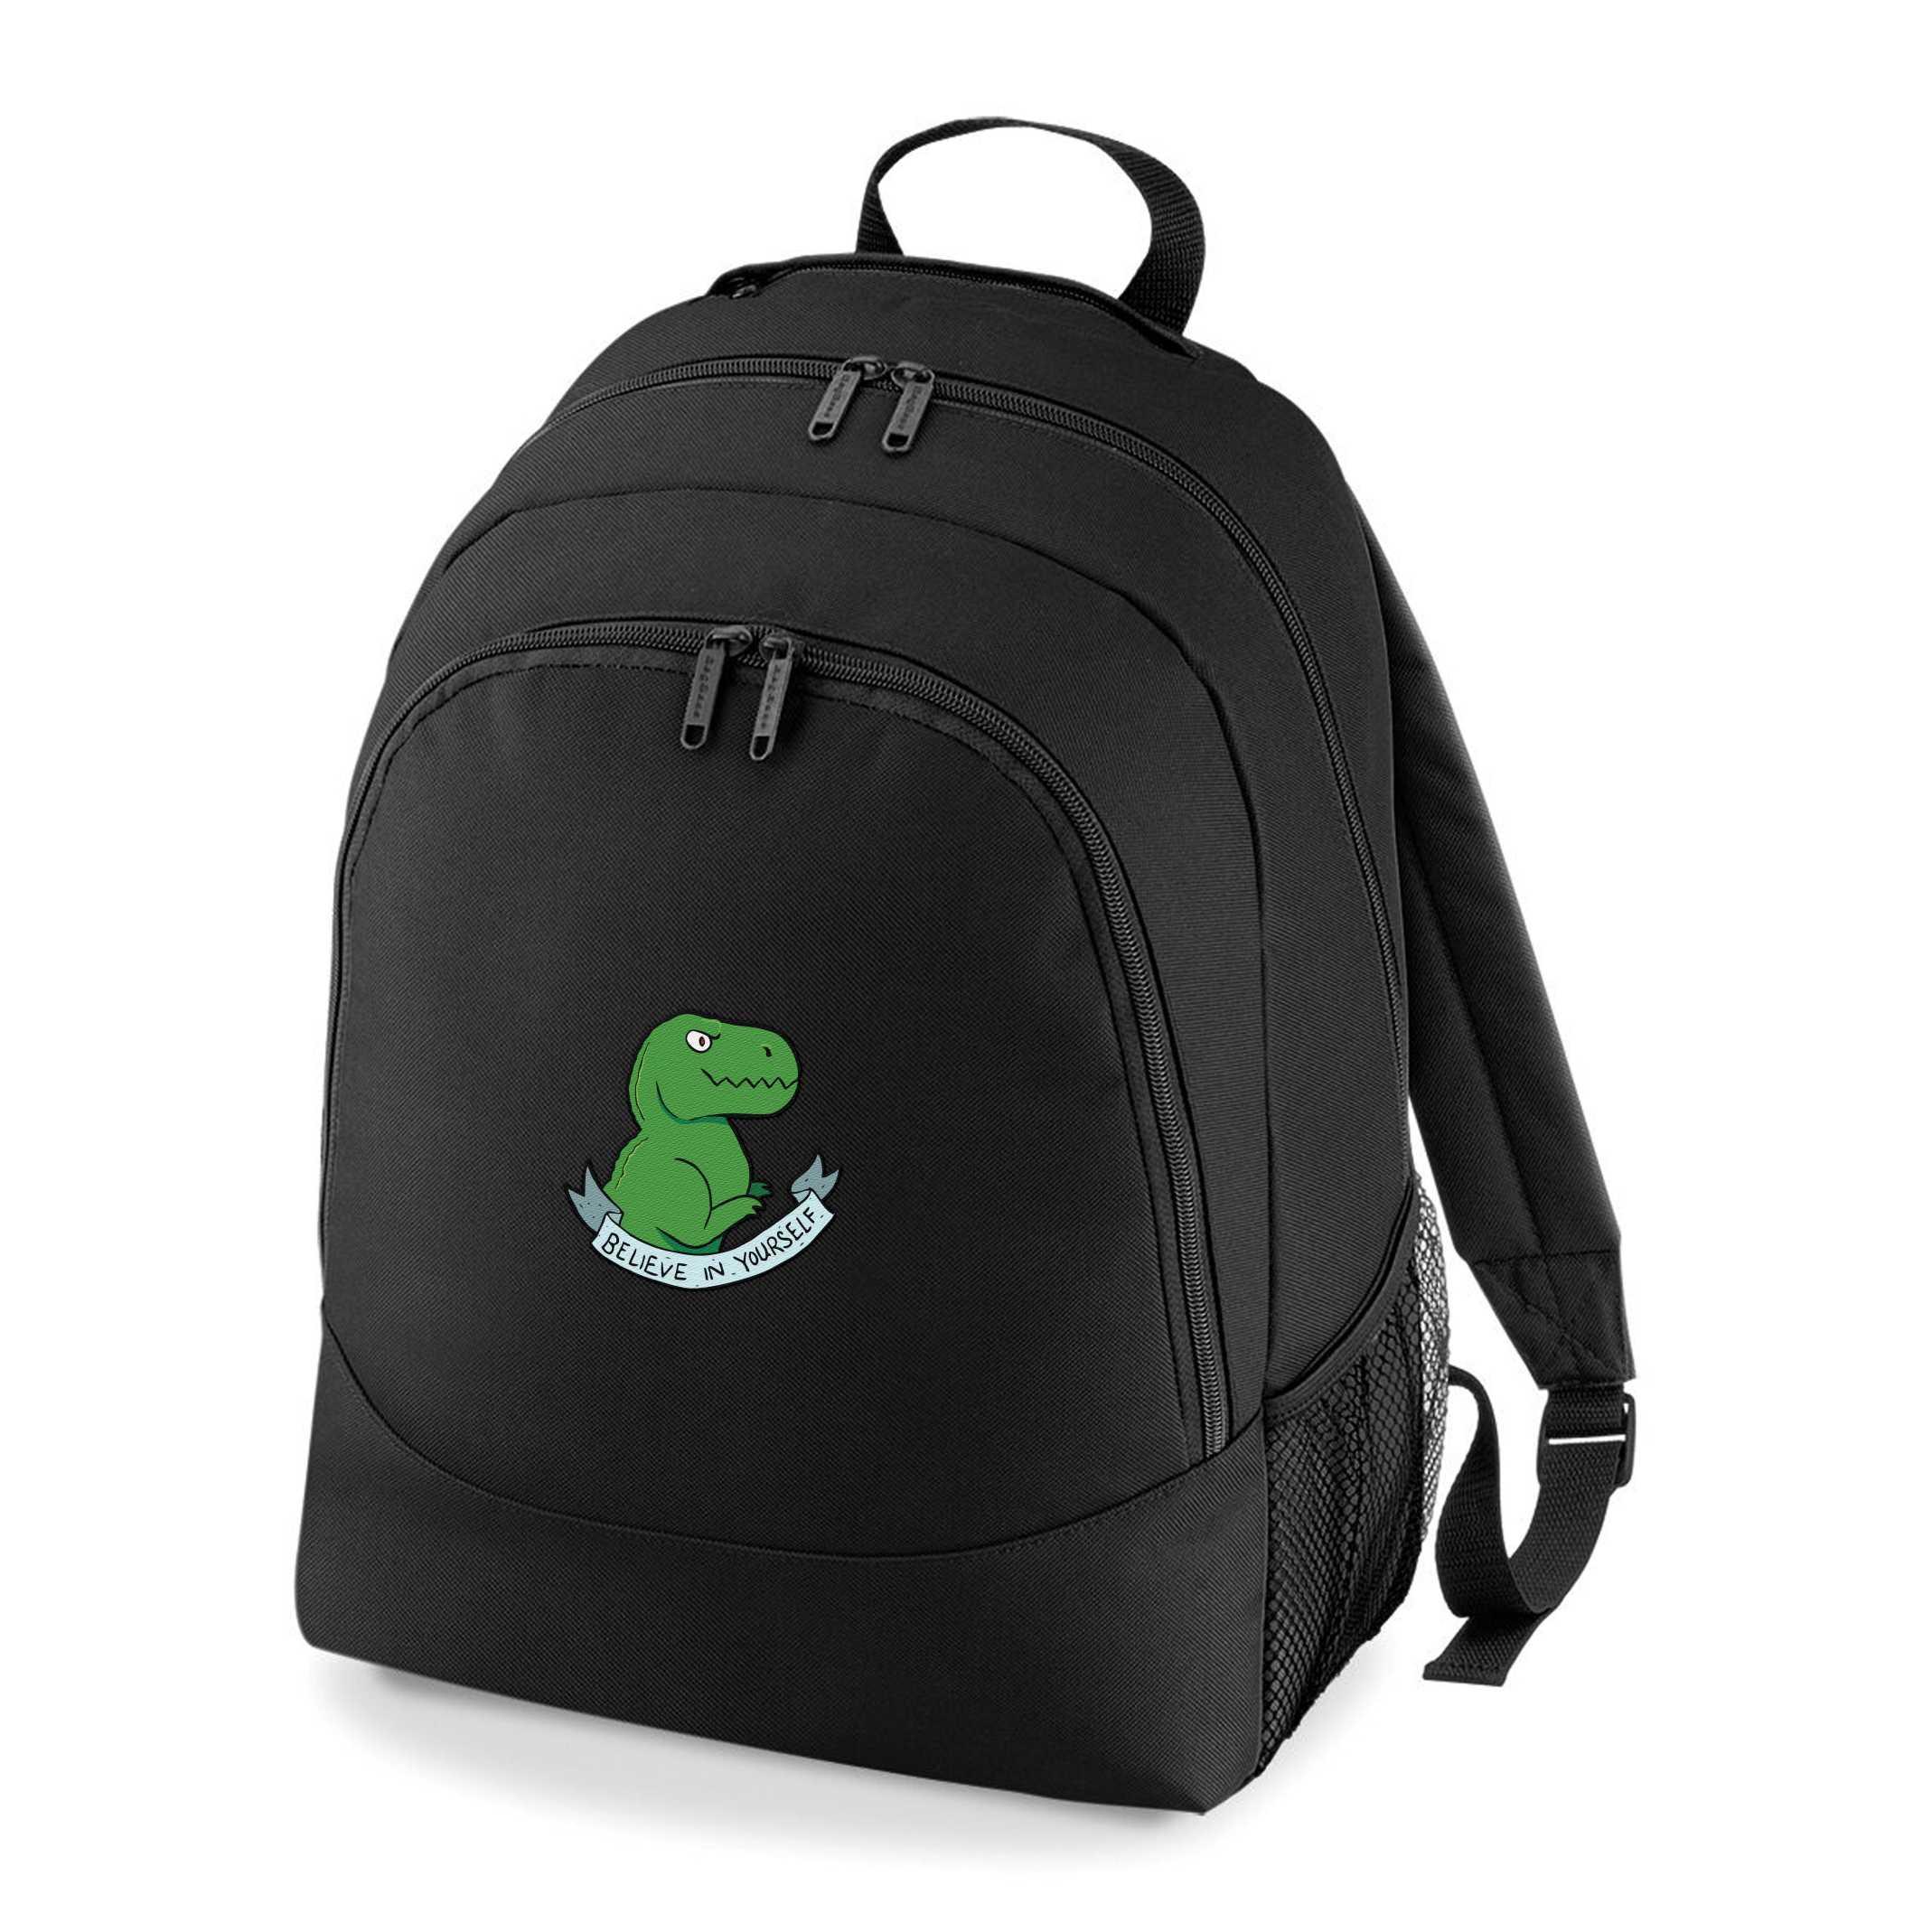 Believe Dinosaur Rucksack bag